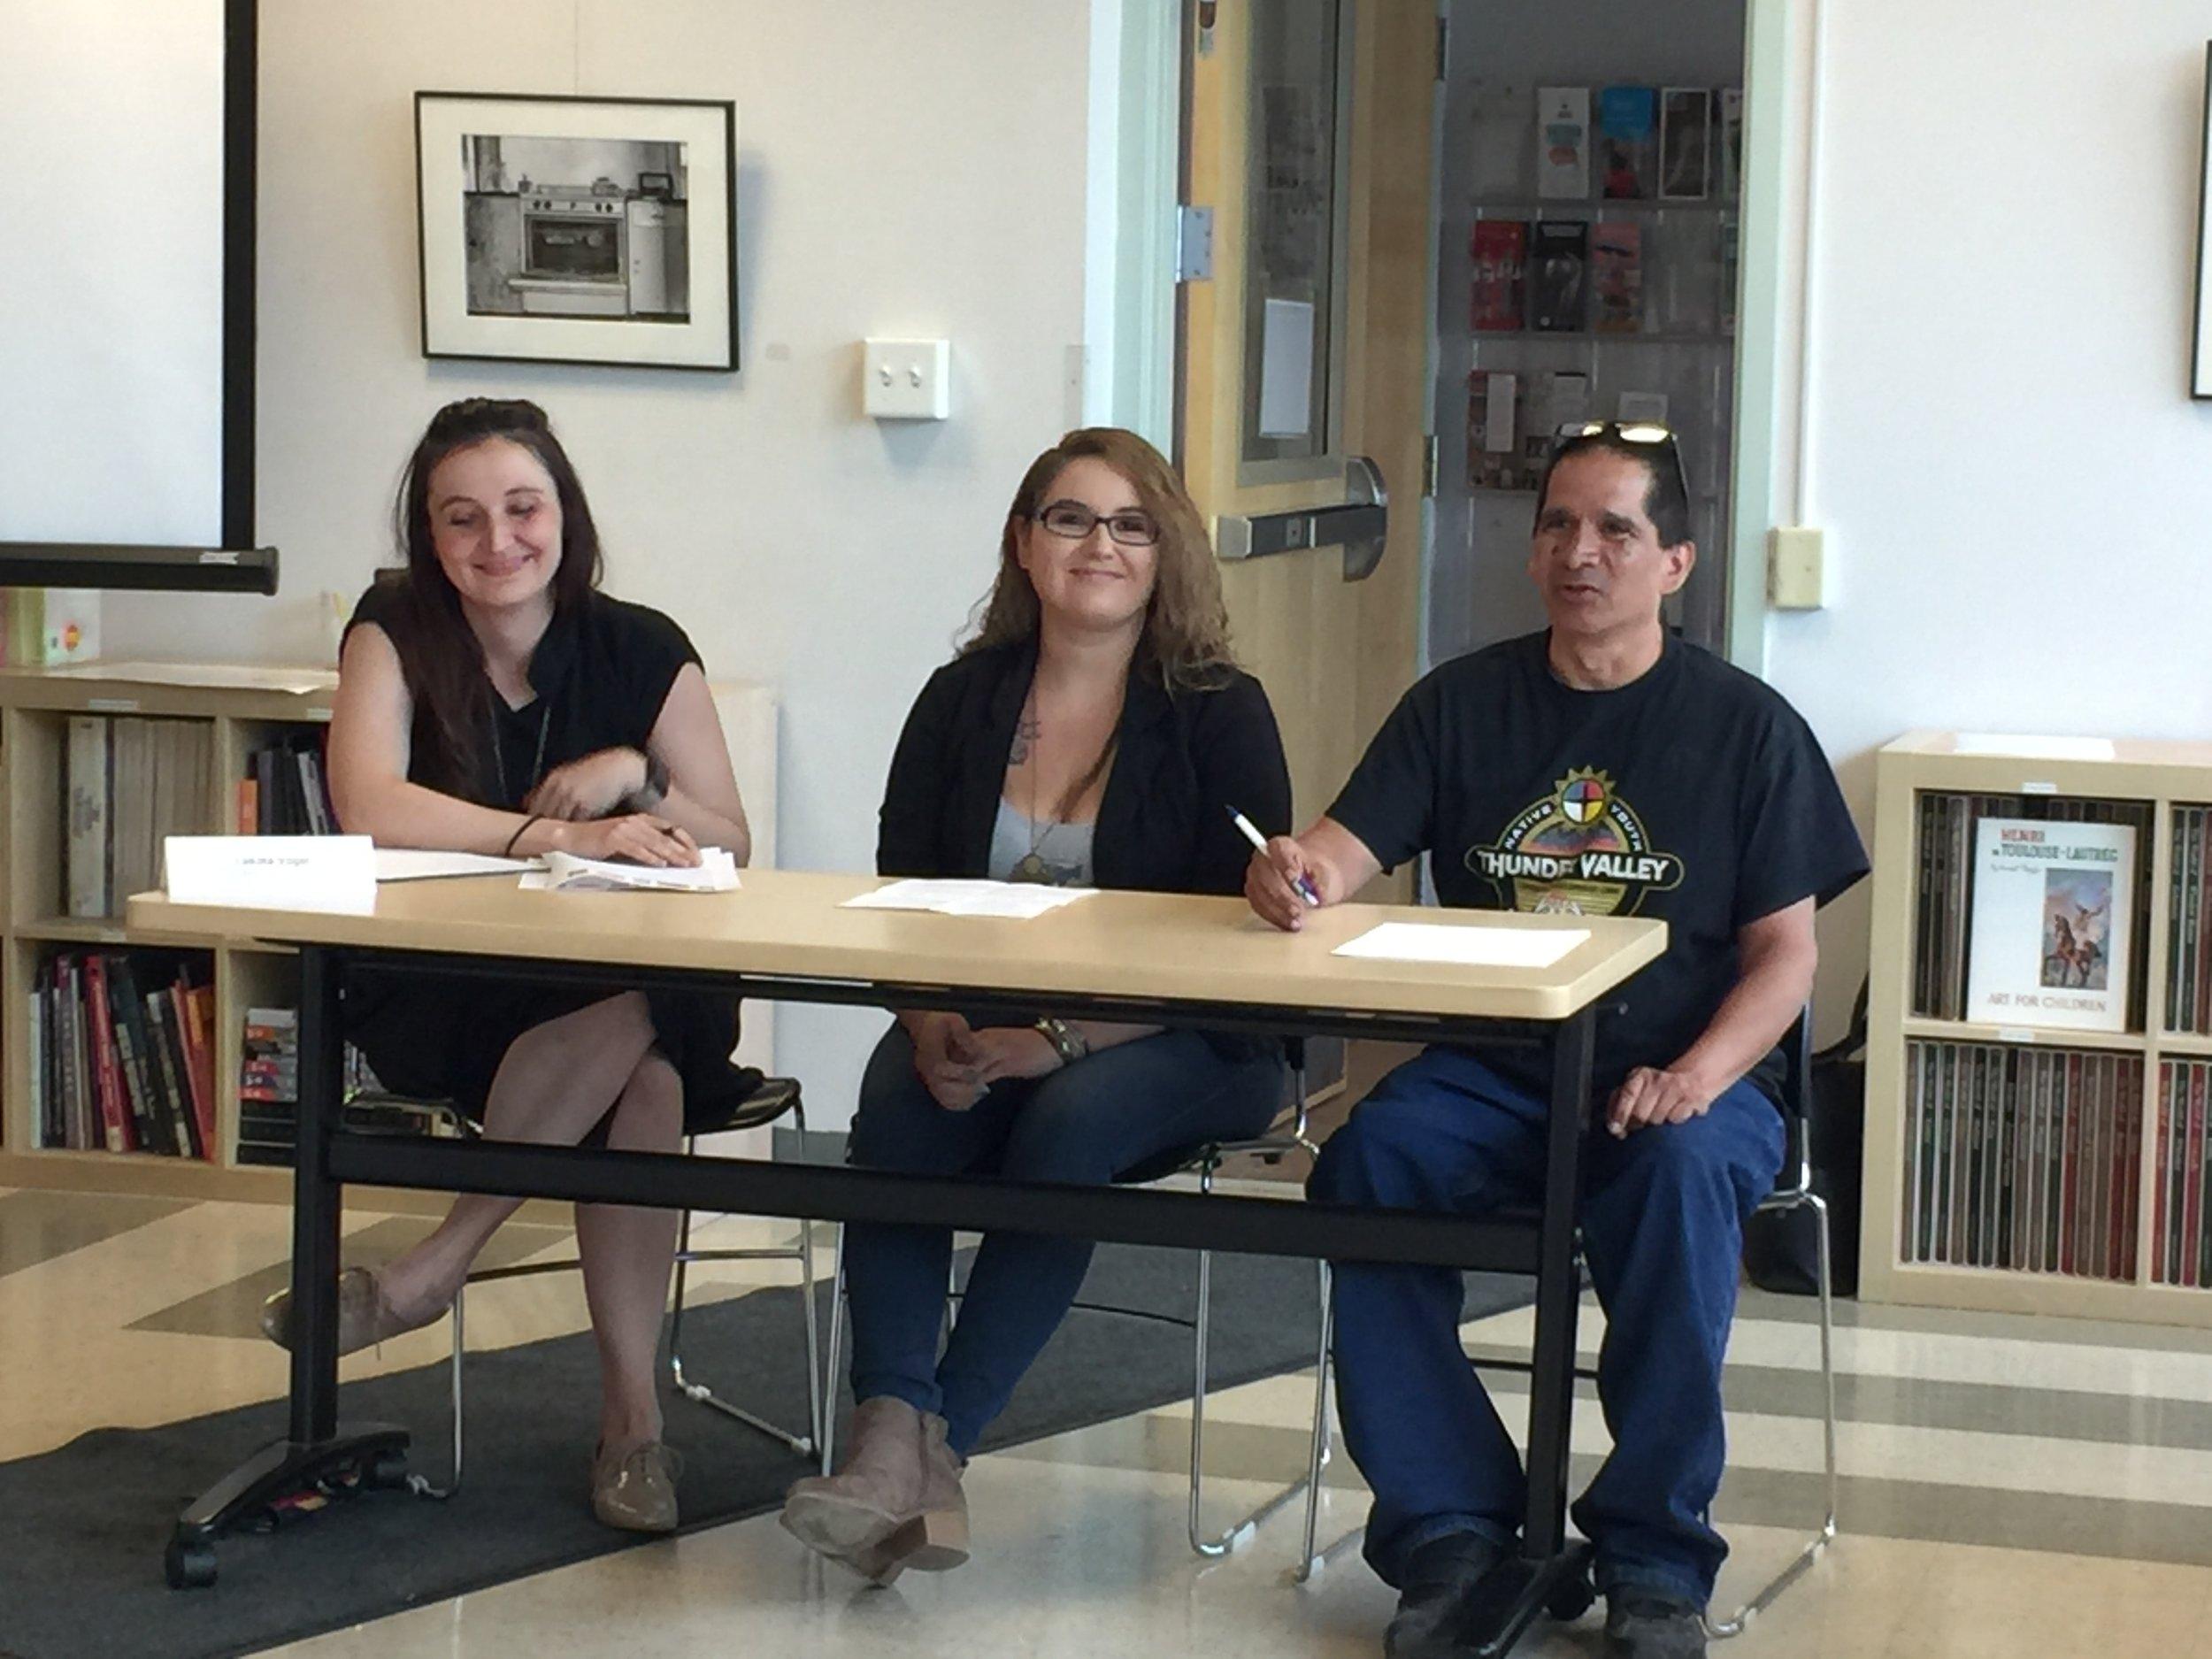 The grantee panel. Left to right: Lakota Vogel (Cheyenne River Sioux Tribe), Executive Director of Four Band Community Fund; Lexxi Hunter (Oglala Lakota), Lakota Federal Credit Union; Andrew Iron Shell (Eastern Band of Cherokee), Community Engagement Coordinator at Thunder Valley Community Development Corporation.